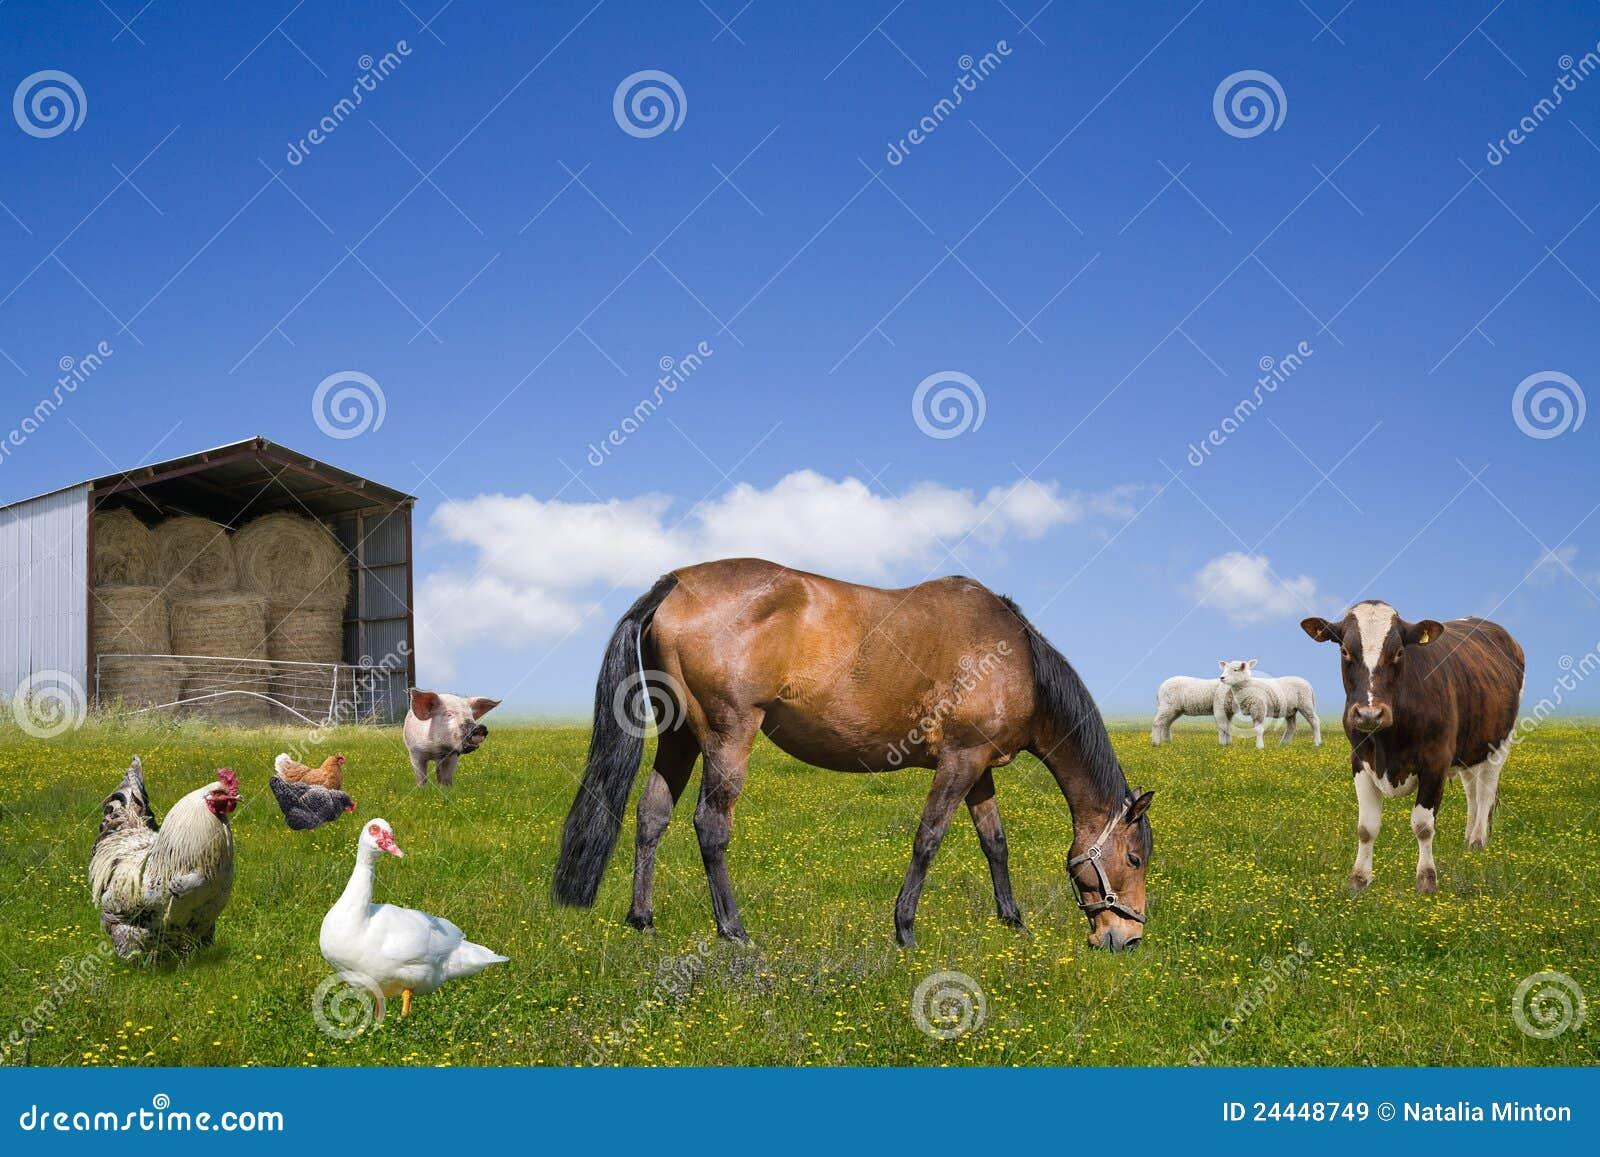 Farm animals grazing on the green field